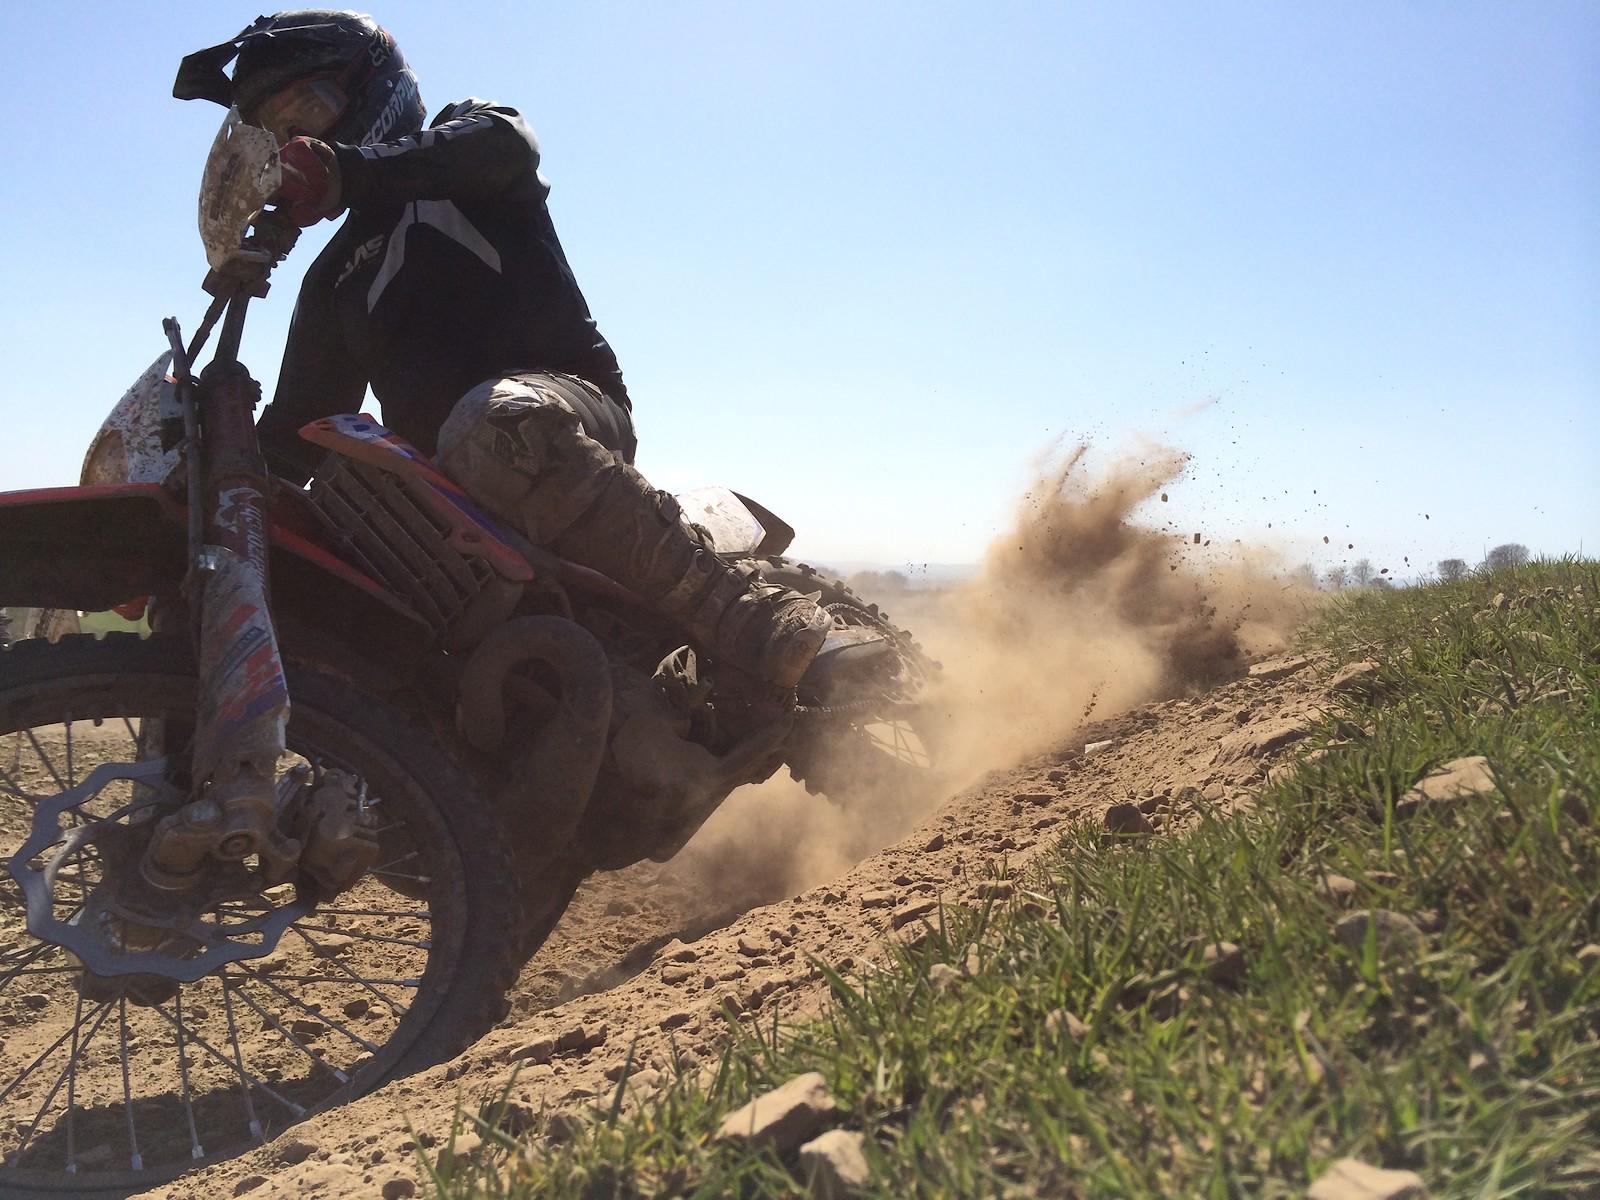 Summer - Matthew Davies - Mountain Biking Pictures - Vital MTB